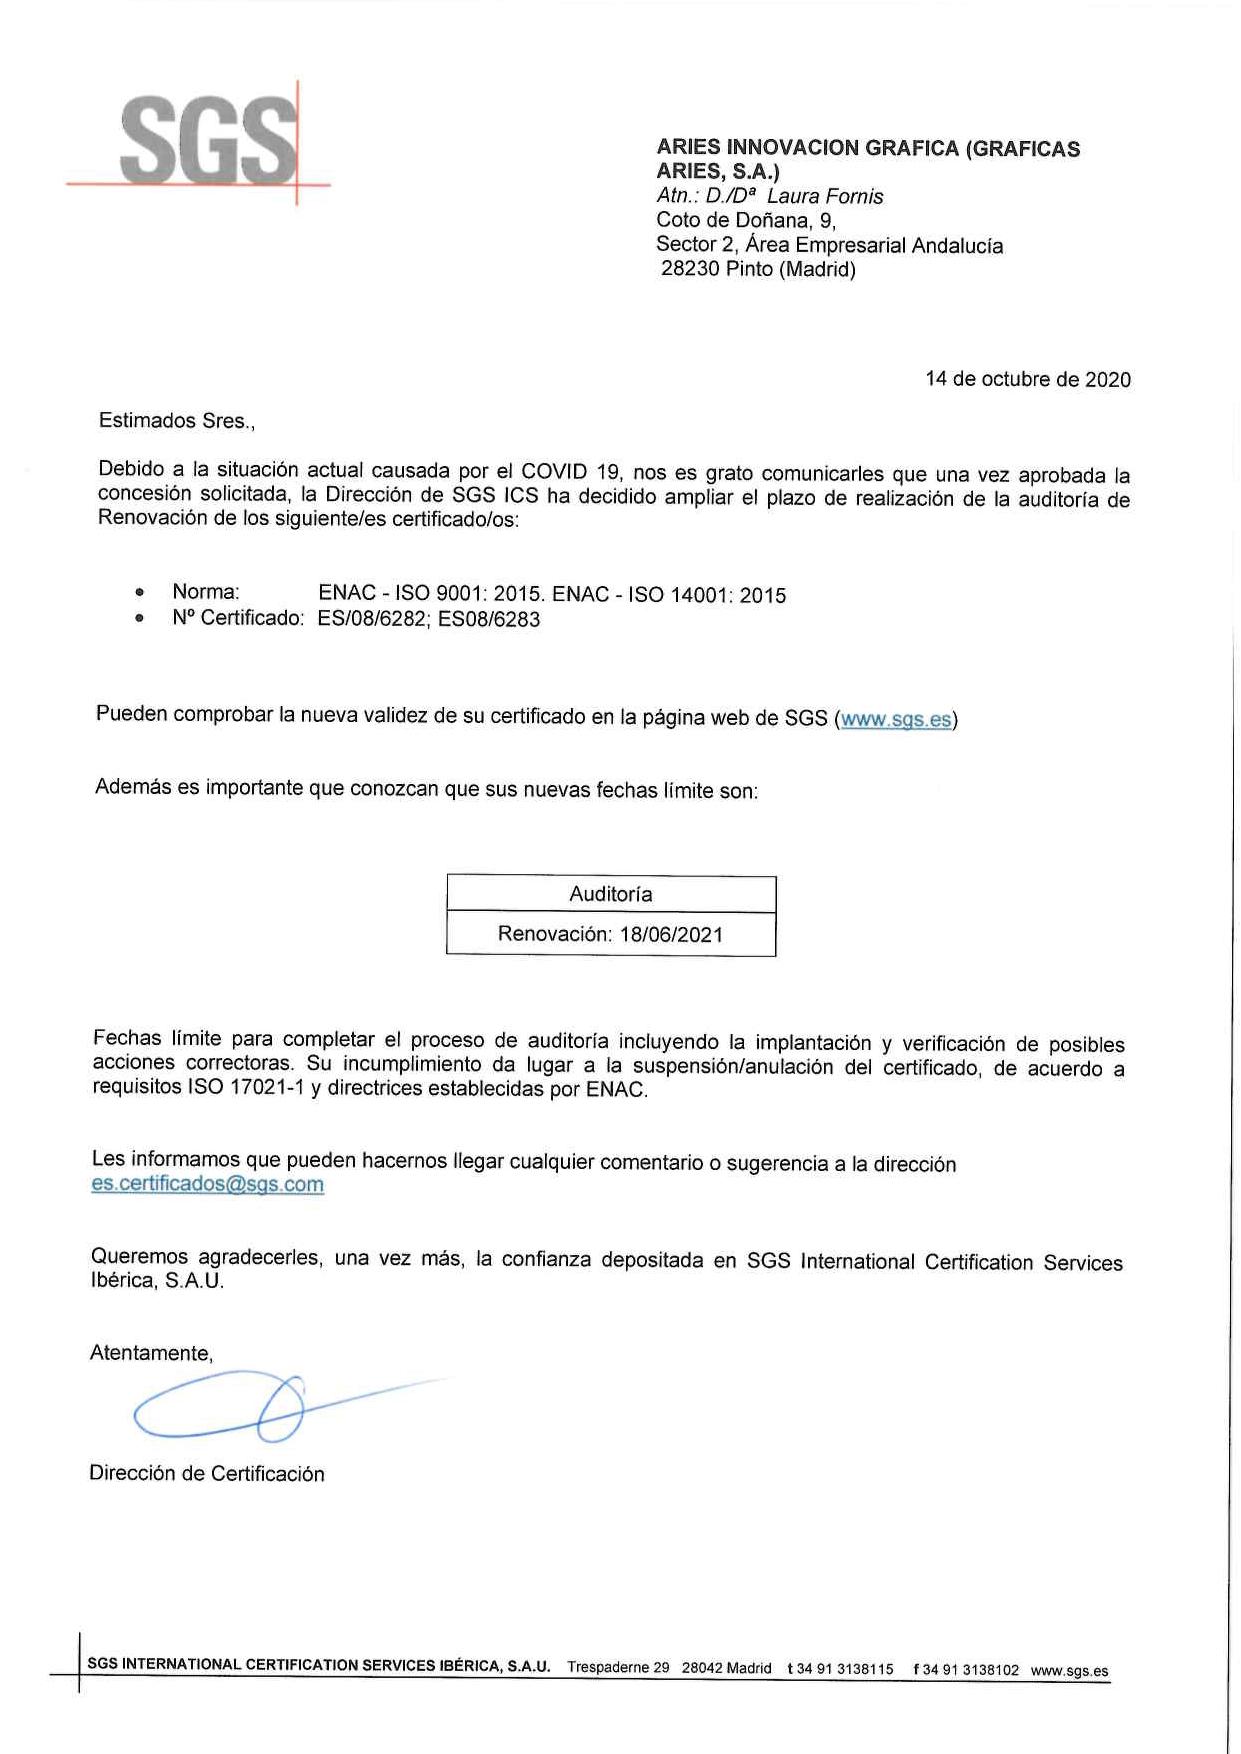 ISOS CARTA CONCESION COVID19 prorroga hasta 18-06-2021_page-0001